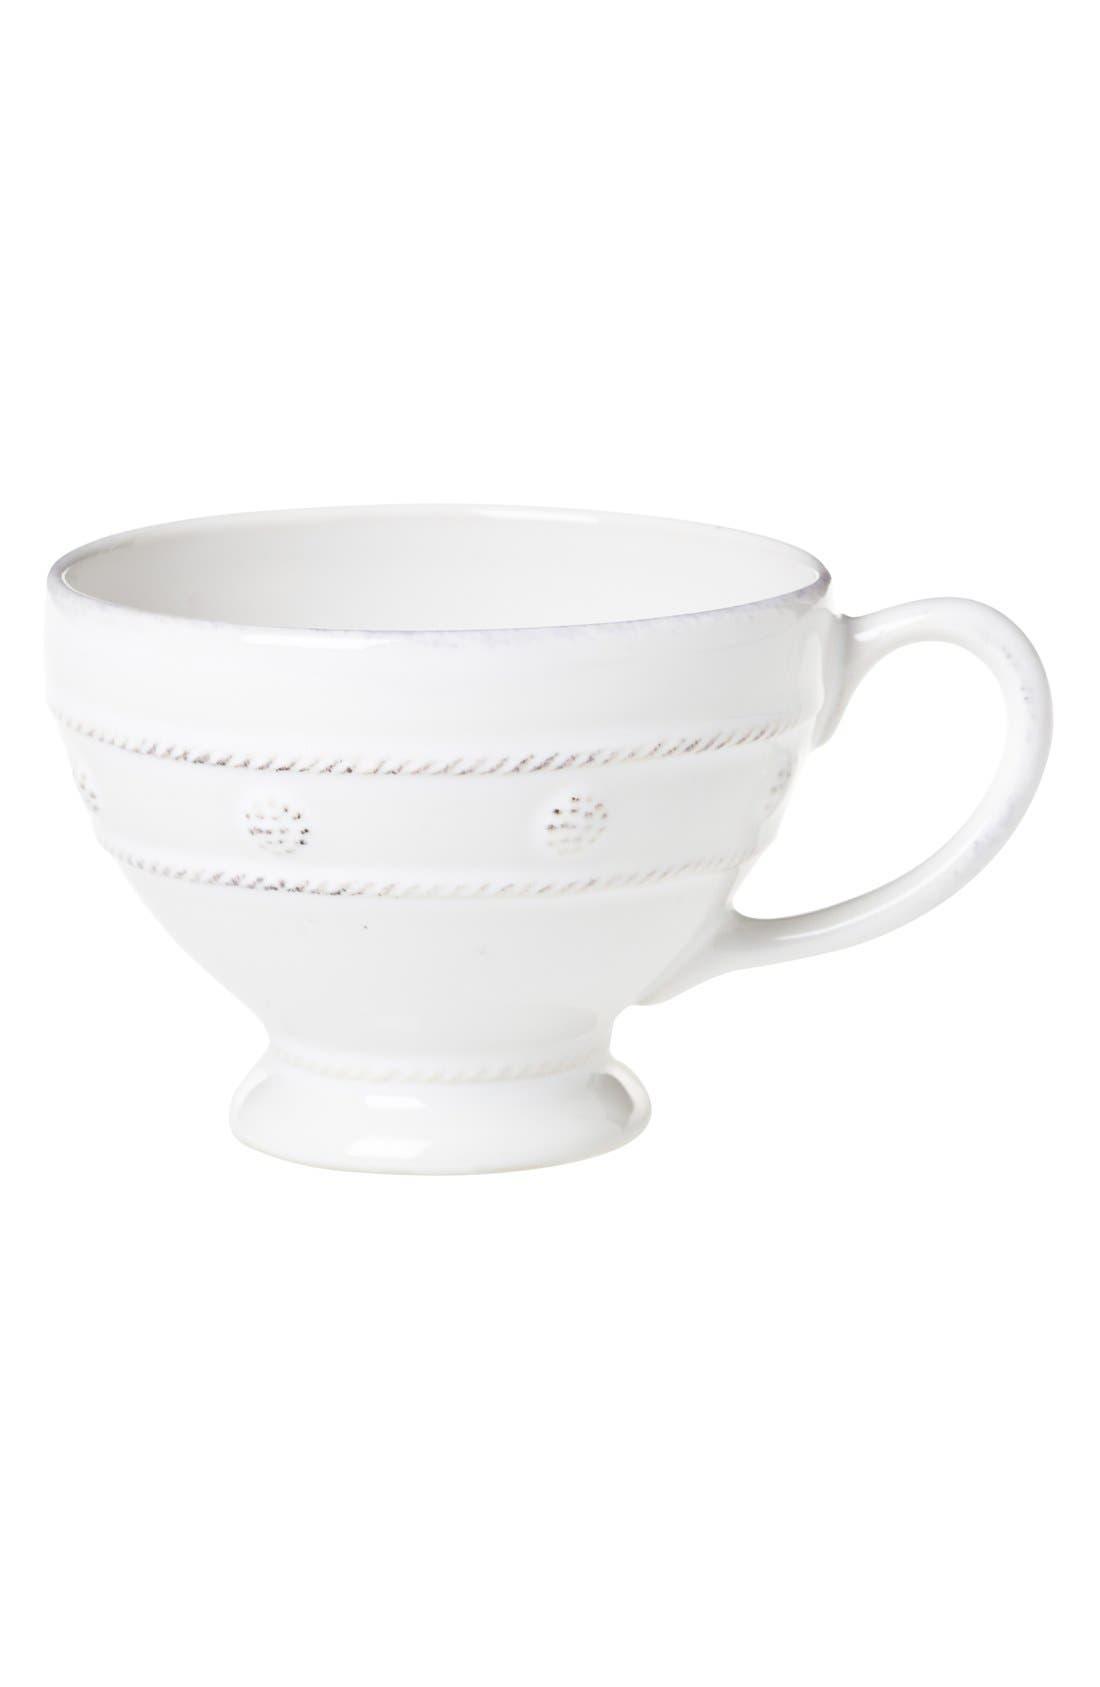 Main Image - Juliska'Berry and Thread' CeramicCoffee Mug